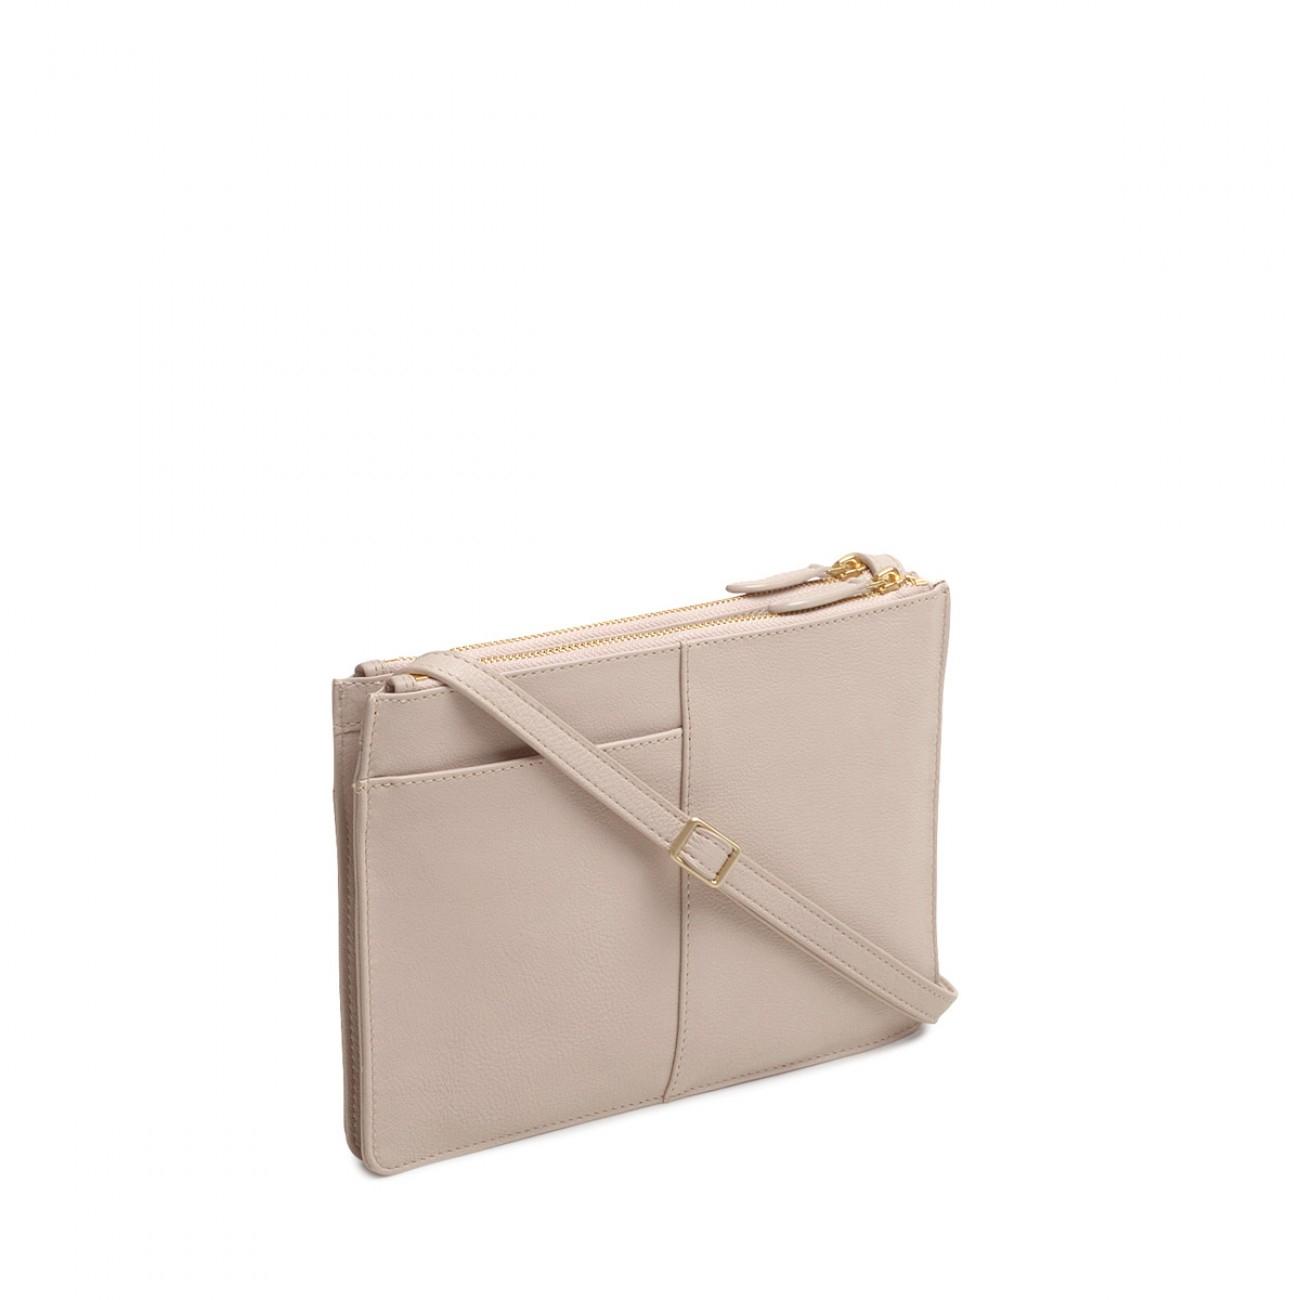 64089cbc7fb Radley Dove Grey Pockets Medium Multi Compartment Cross Body Bag ...